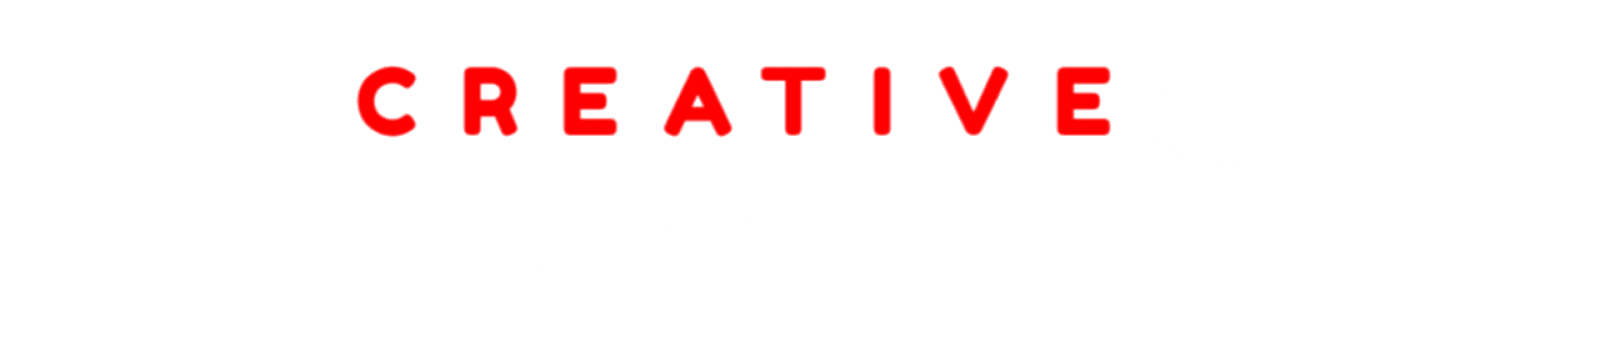 Creative Kannada - Latest Kannada Movies | News & Updates